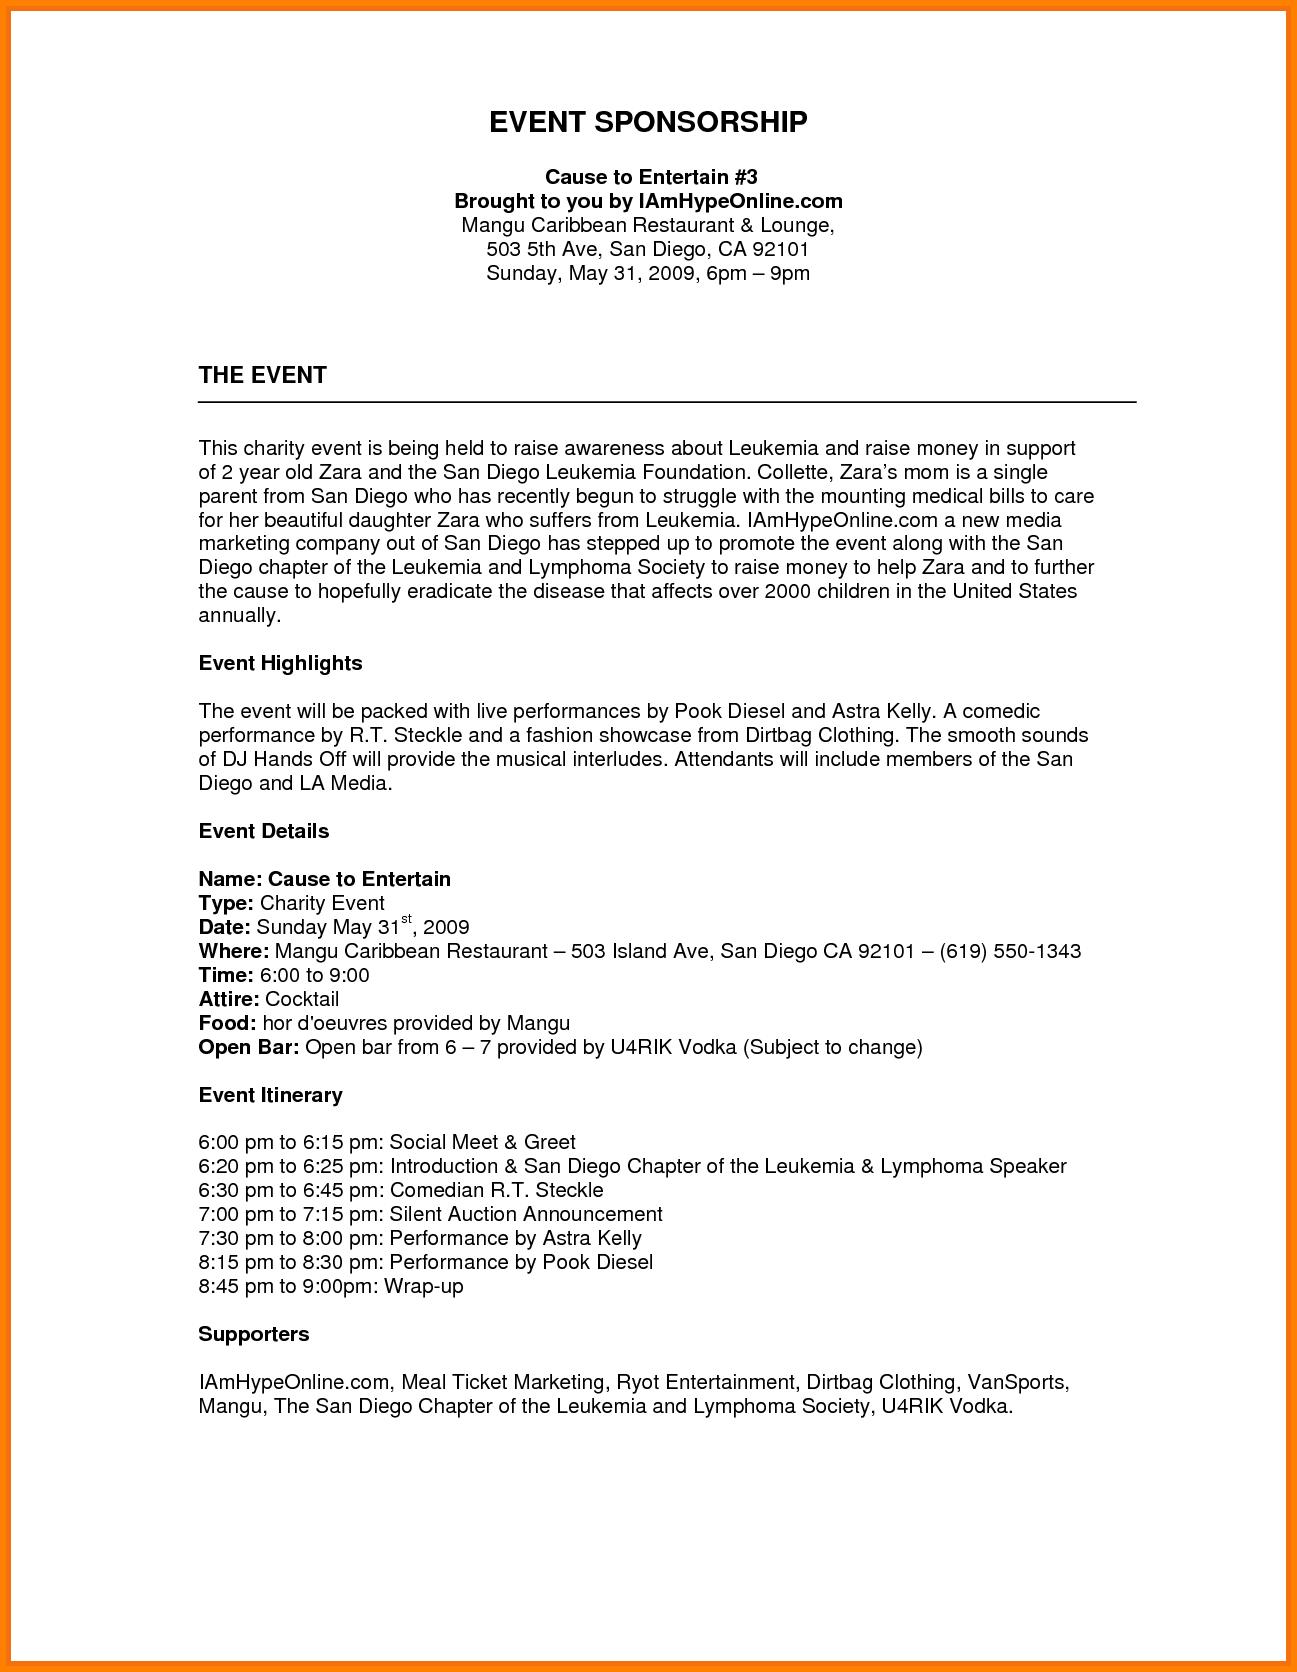 sponsorship proposal letter template Collection-Image result for sponsorship proposal template FinanceTemplate Finance 1-r